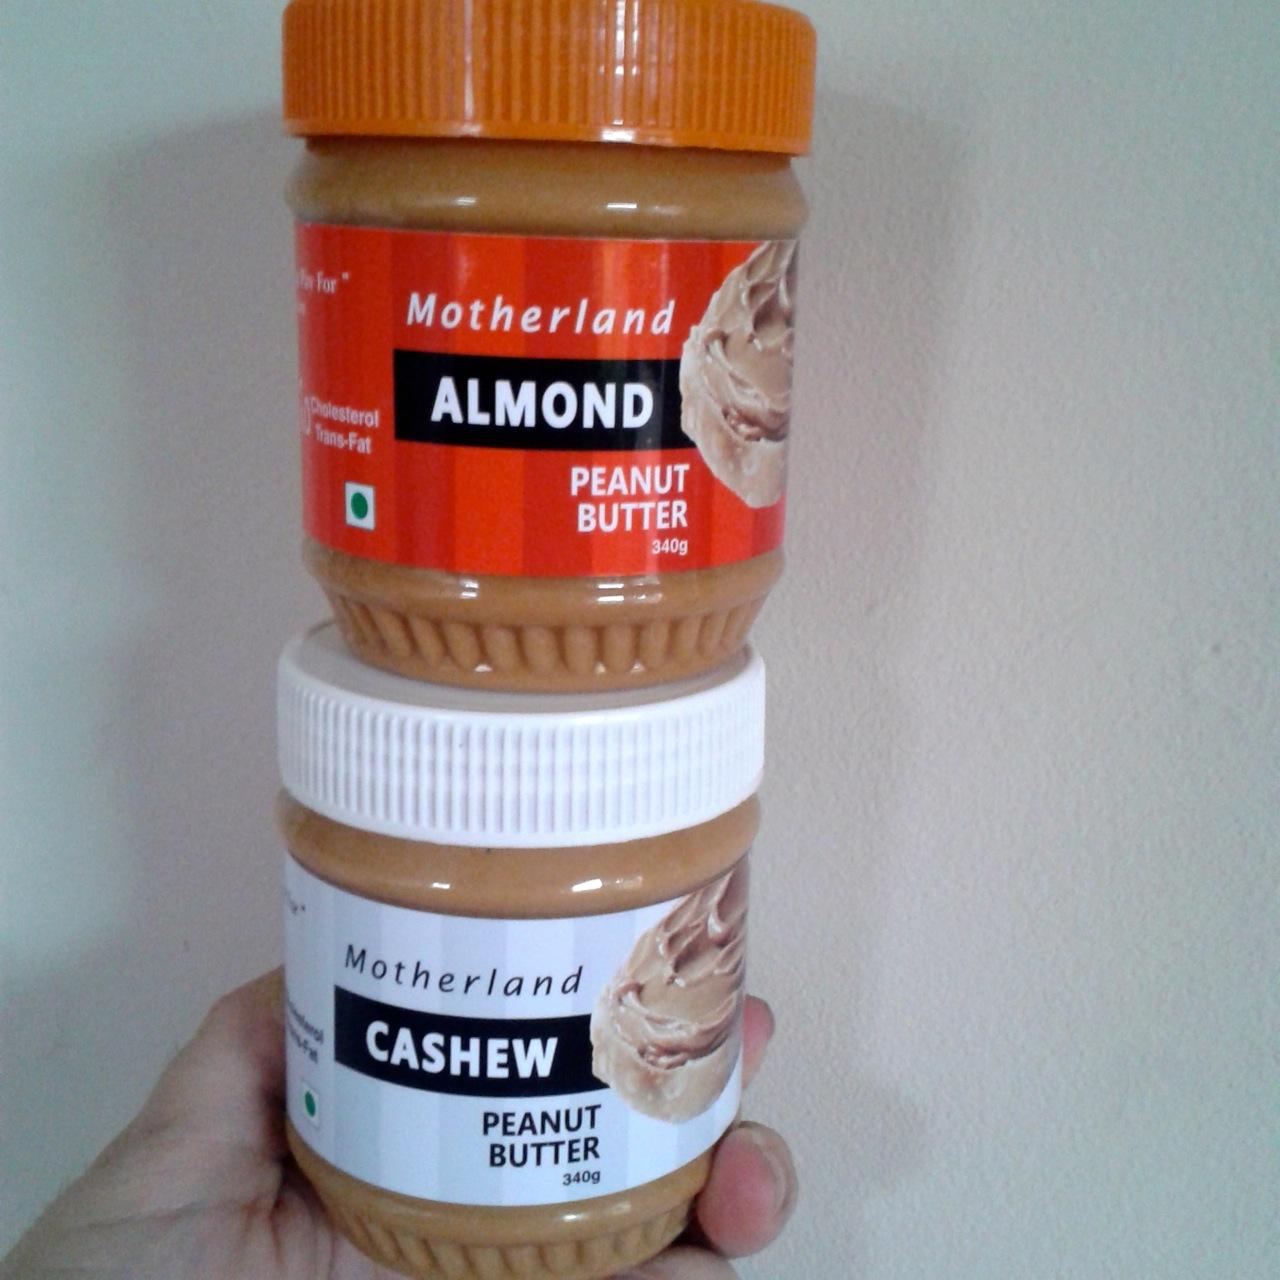 http://fatgayvegan.com/wp-content/uploads/2015/04/peanut-butter.jpg